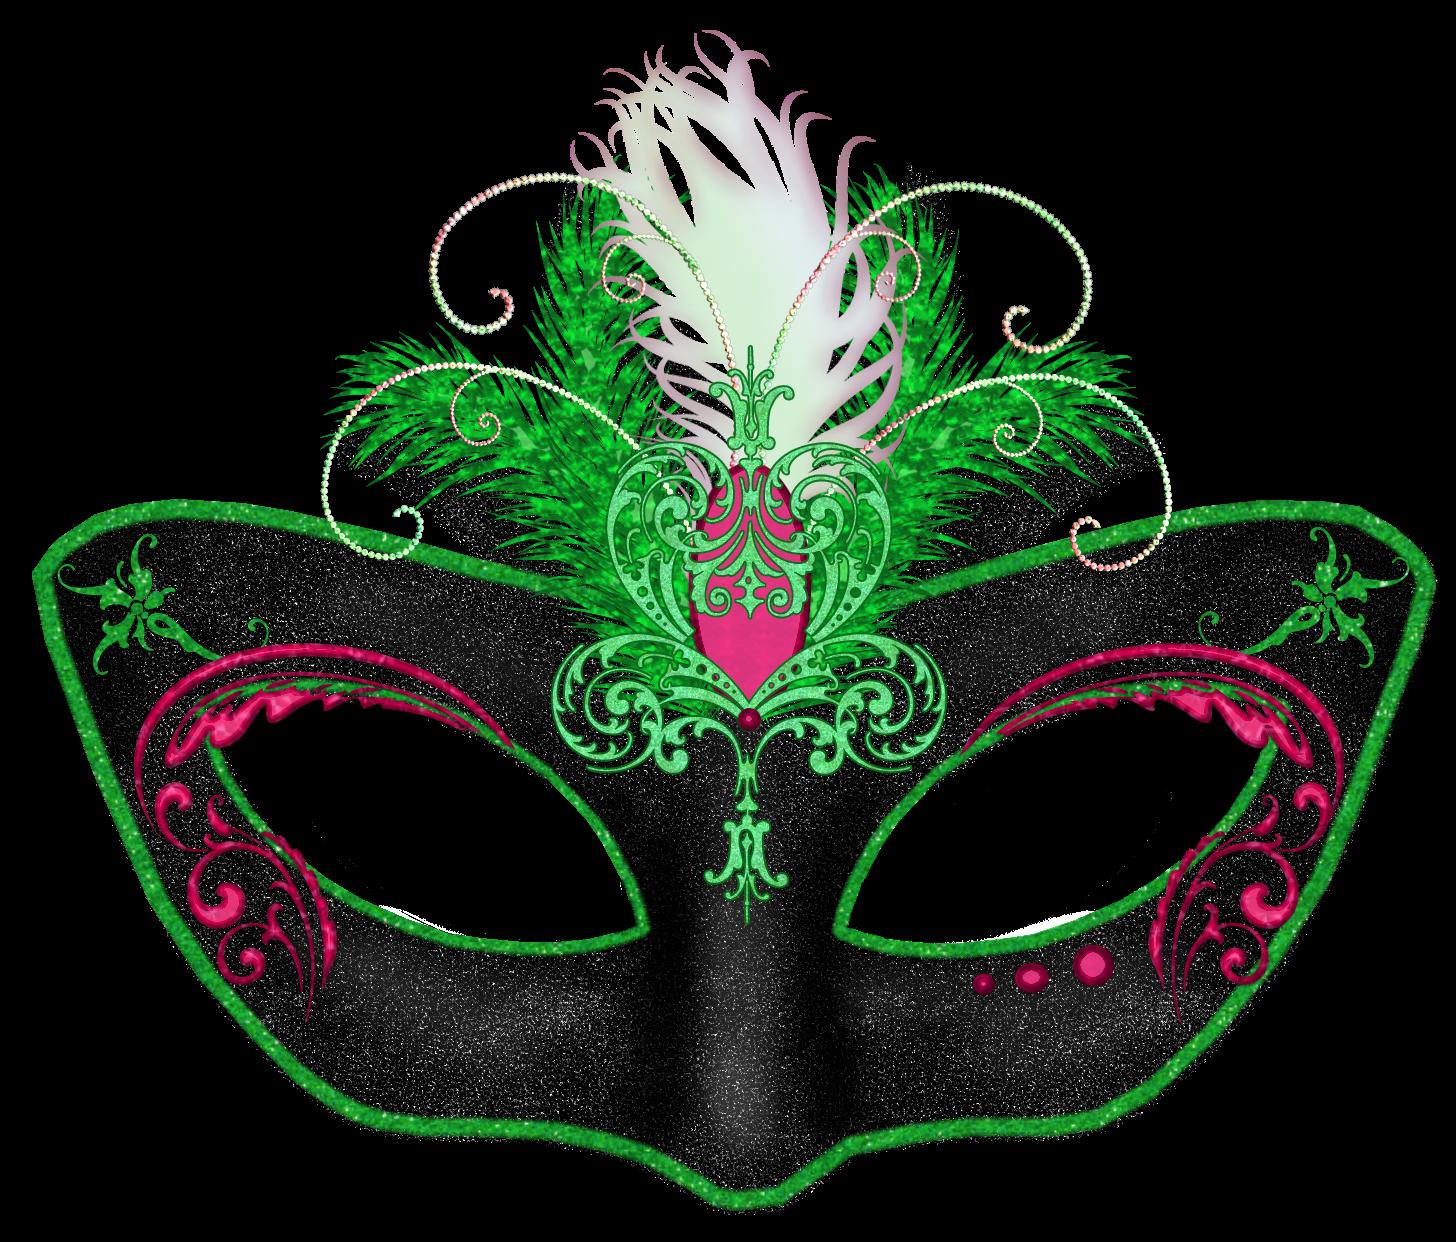 Halloween eye mask clipart image transparent library Bella LuElla: February 2014 image transparent library